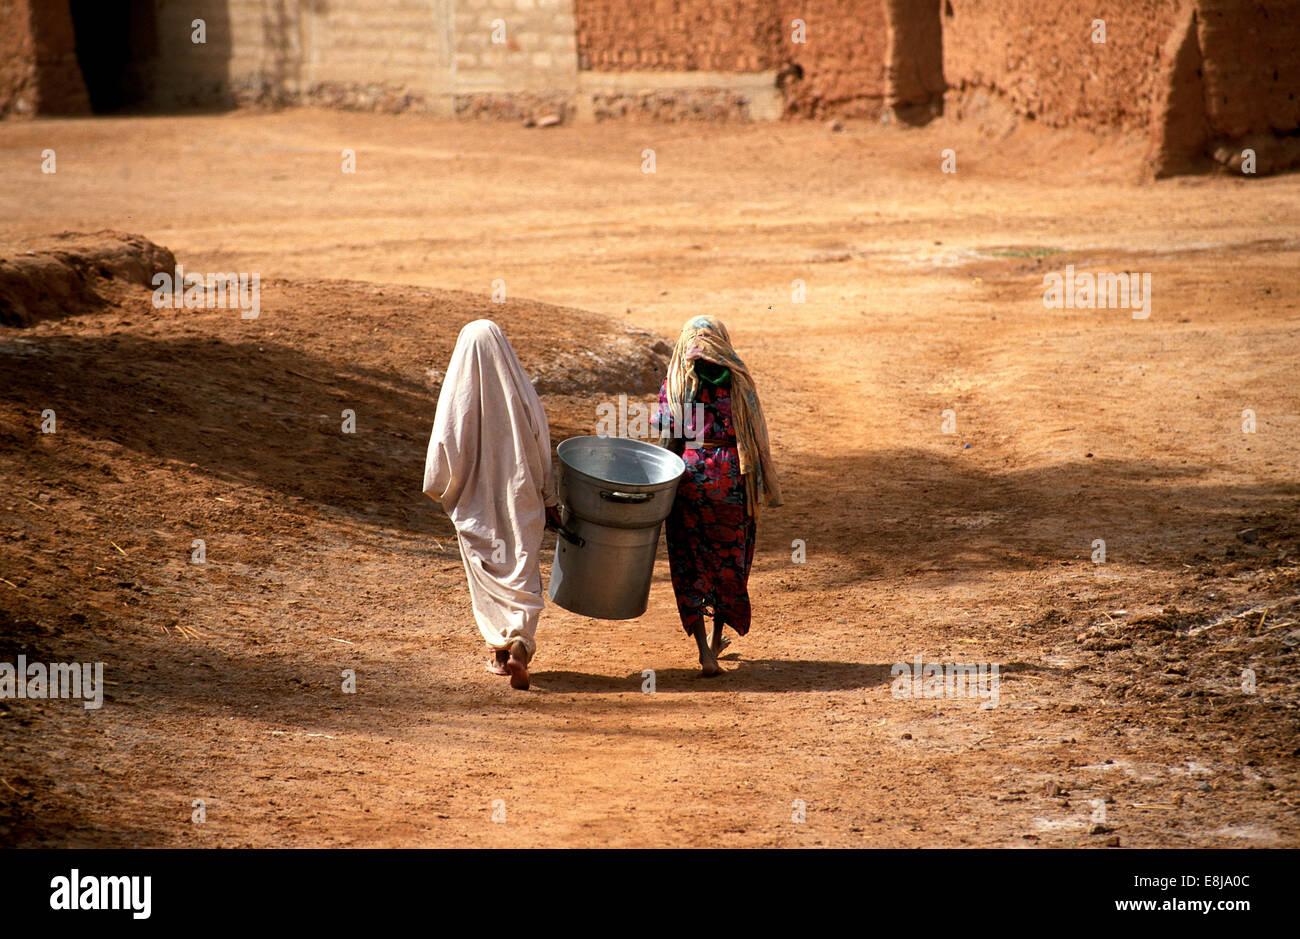 Tuareg population of Timimoun in Algeria. Two women walking home from the market. - Stock Image